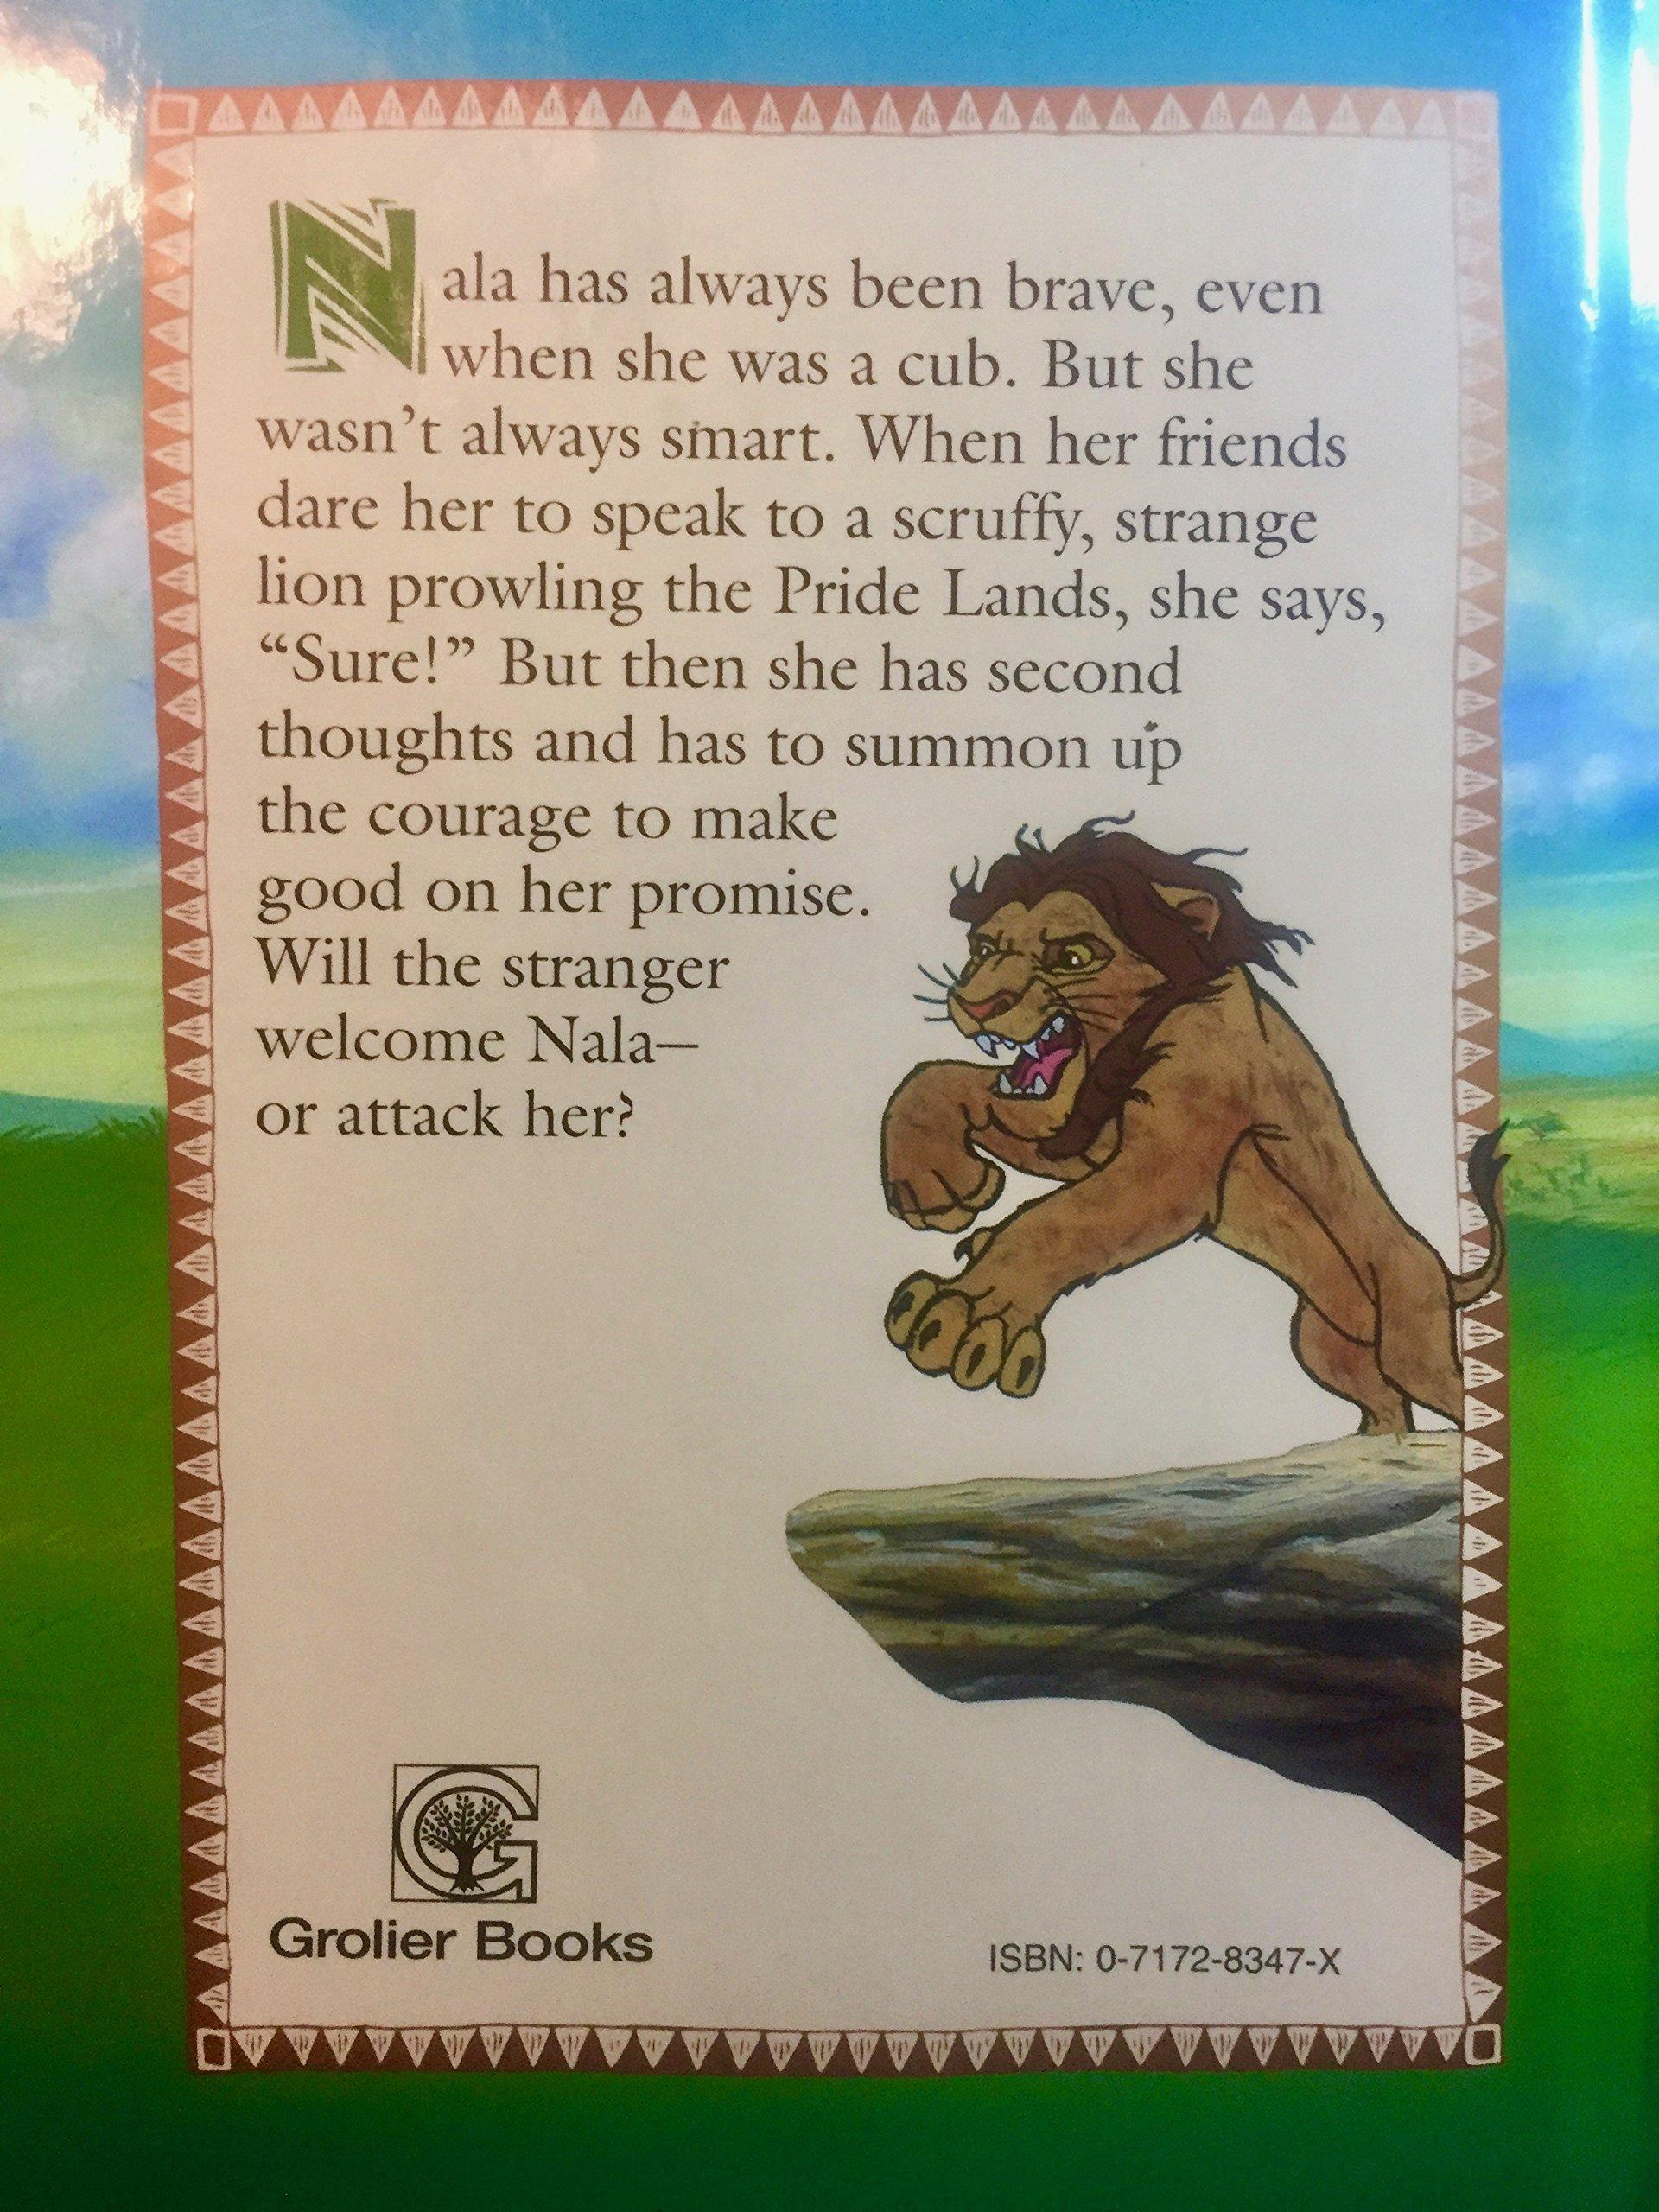 Nala S Dare The Lion King 2 Joanne Barkan 9780717284719 Amazon Com Books